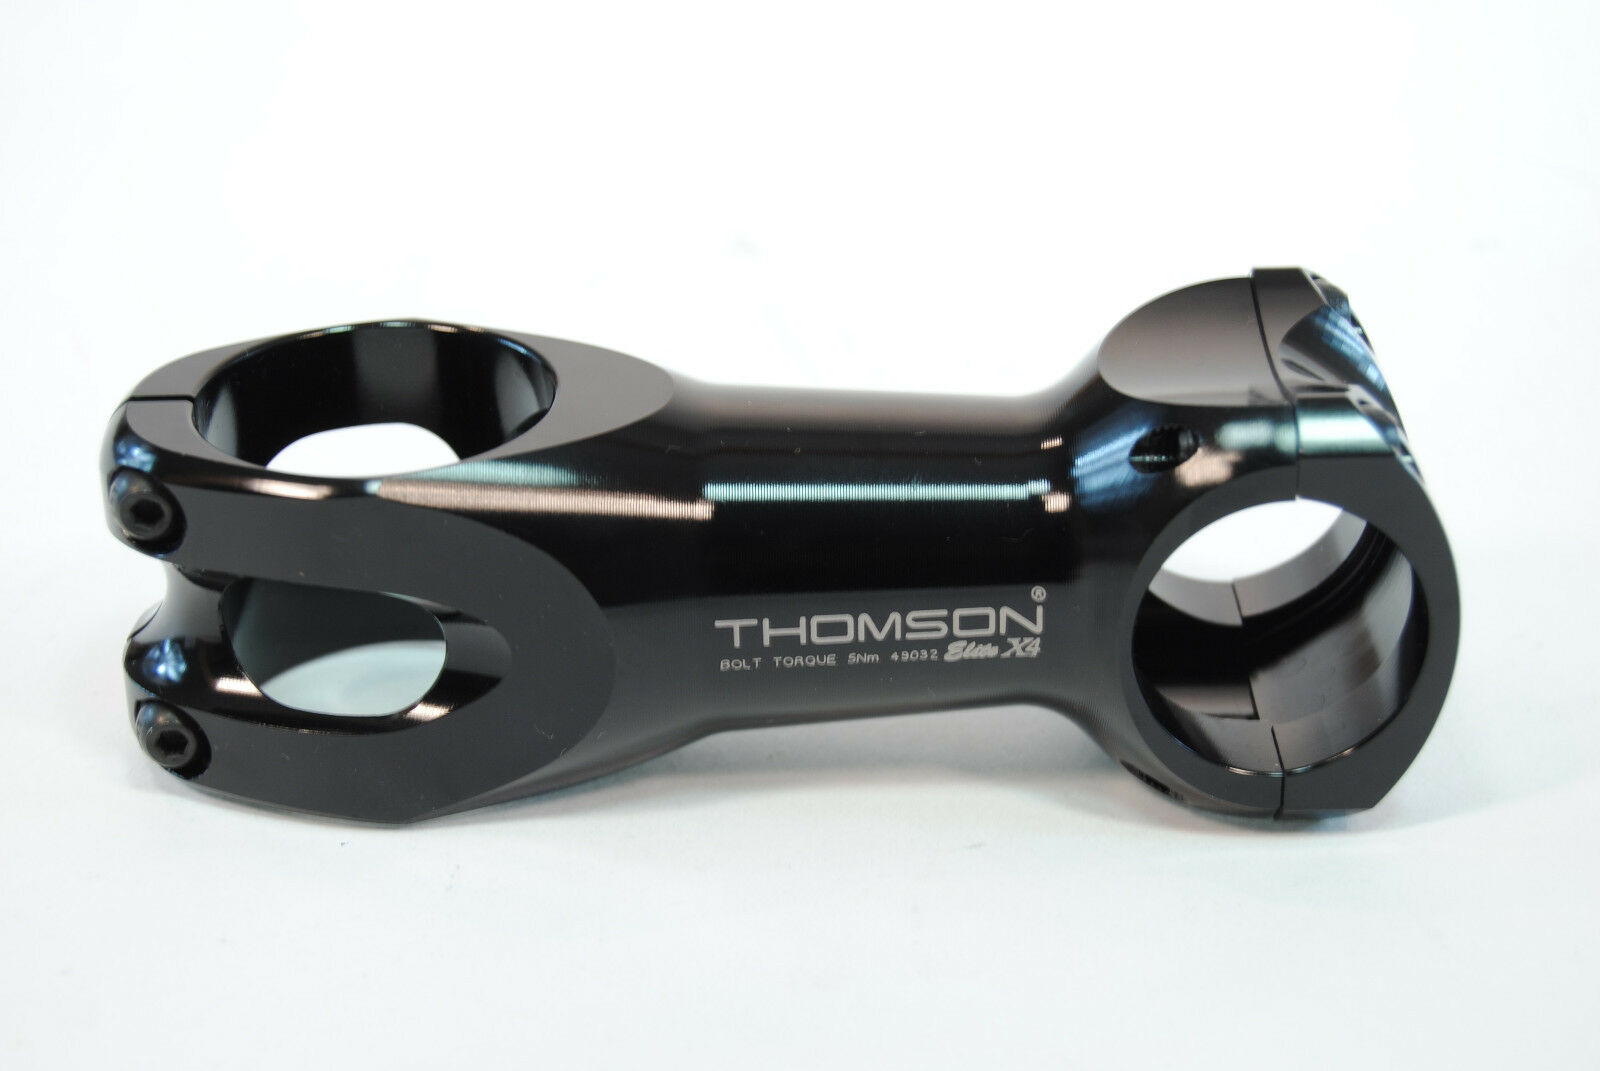 Thomson Elite X4 Mountain Bike Stem 95mm 31.8mm 1.5  0d